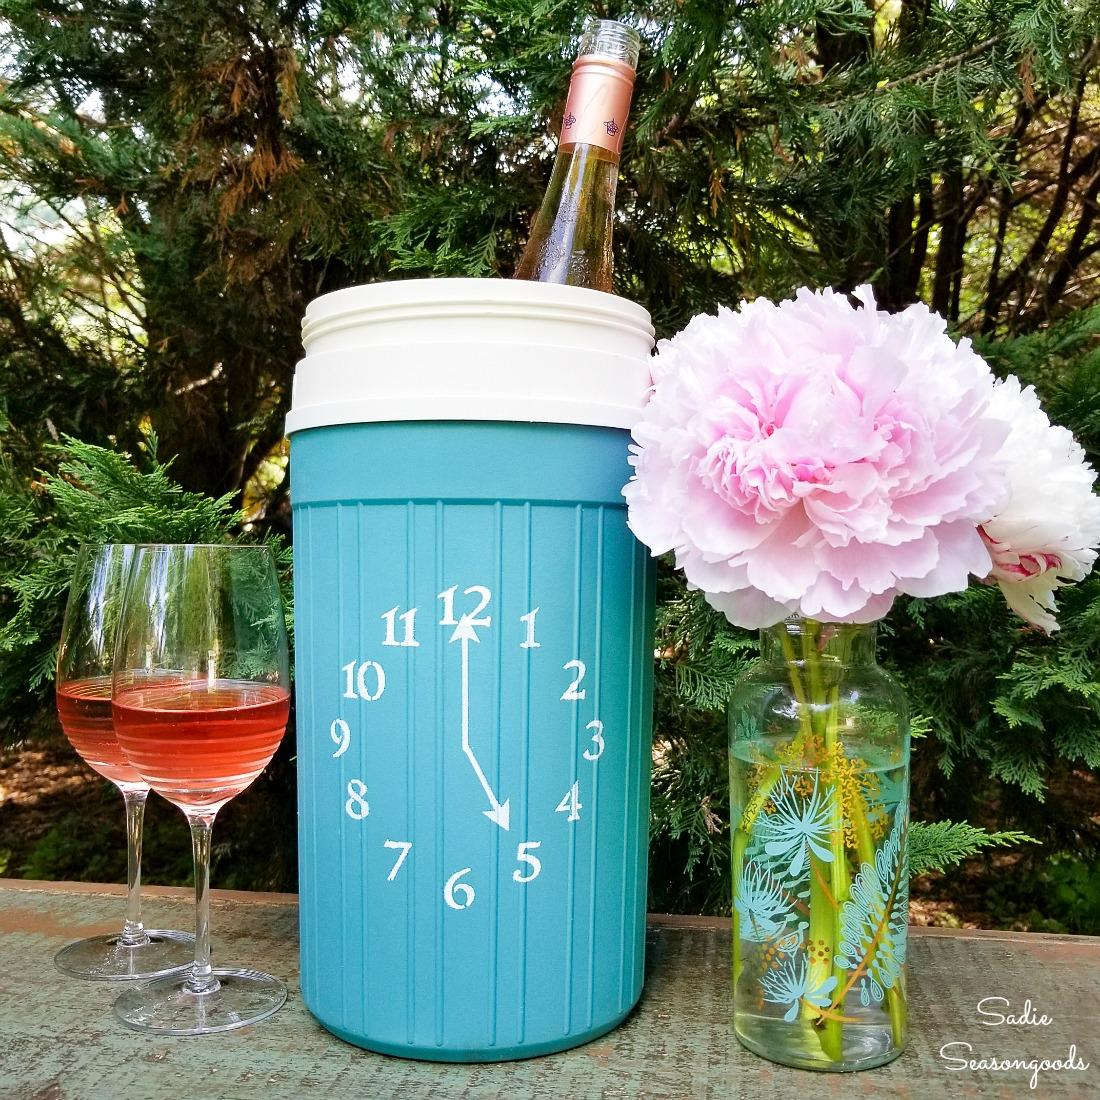 DIY Wine Bottle Cooler for Happy Hour at Home